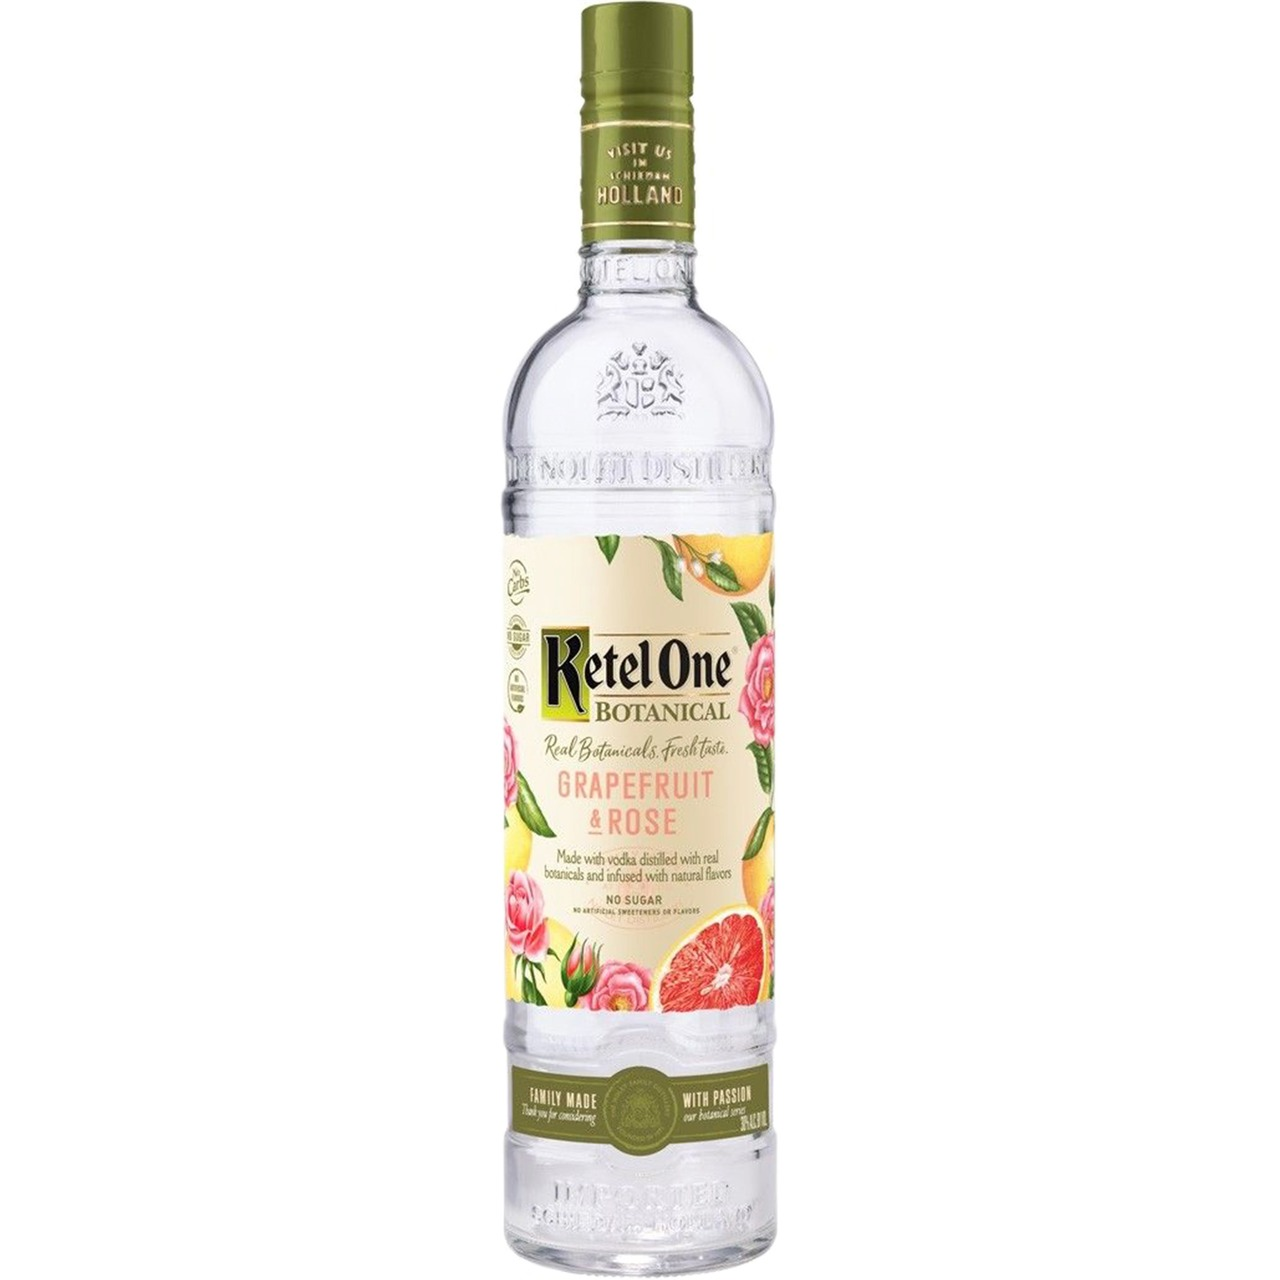 Ketel One Grapefruit & Rose